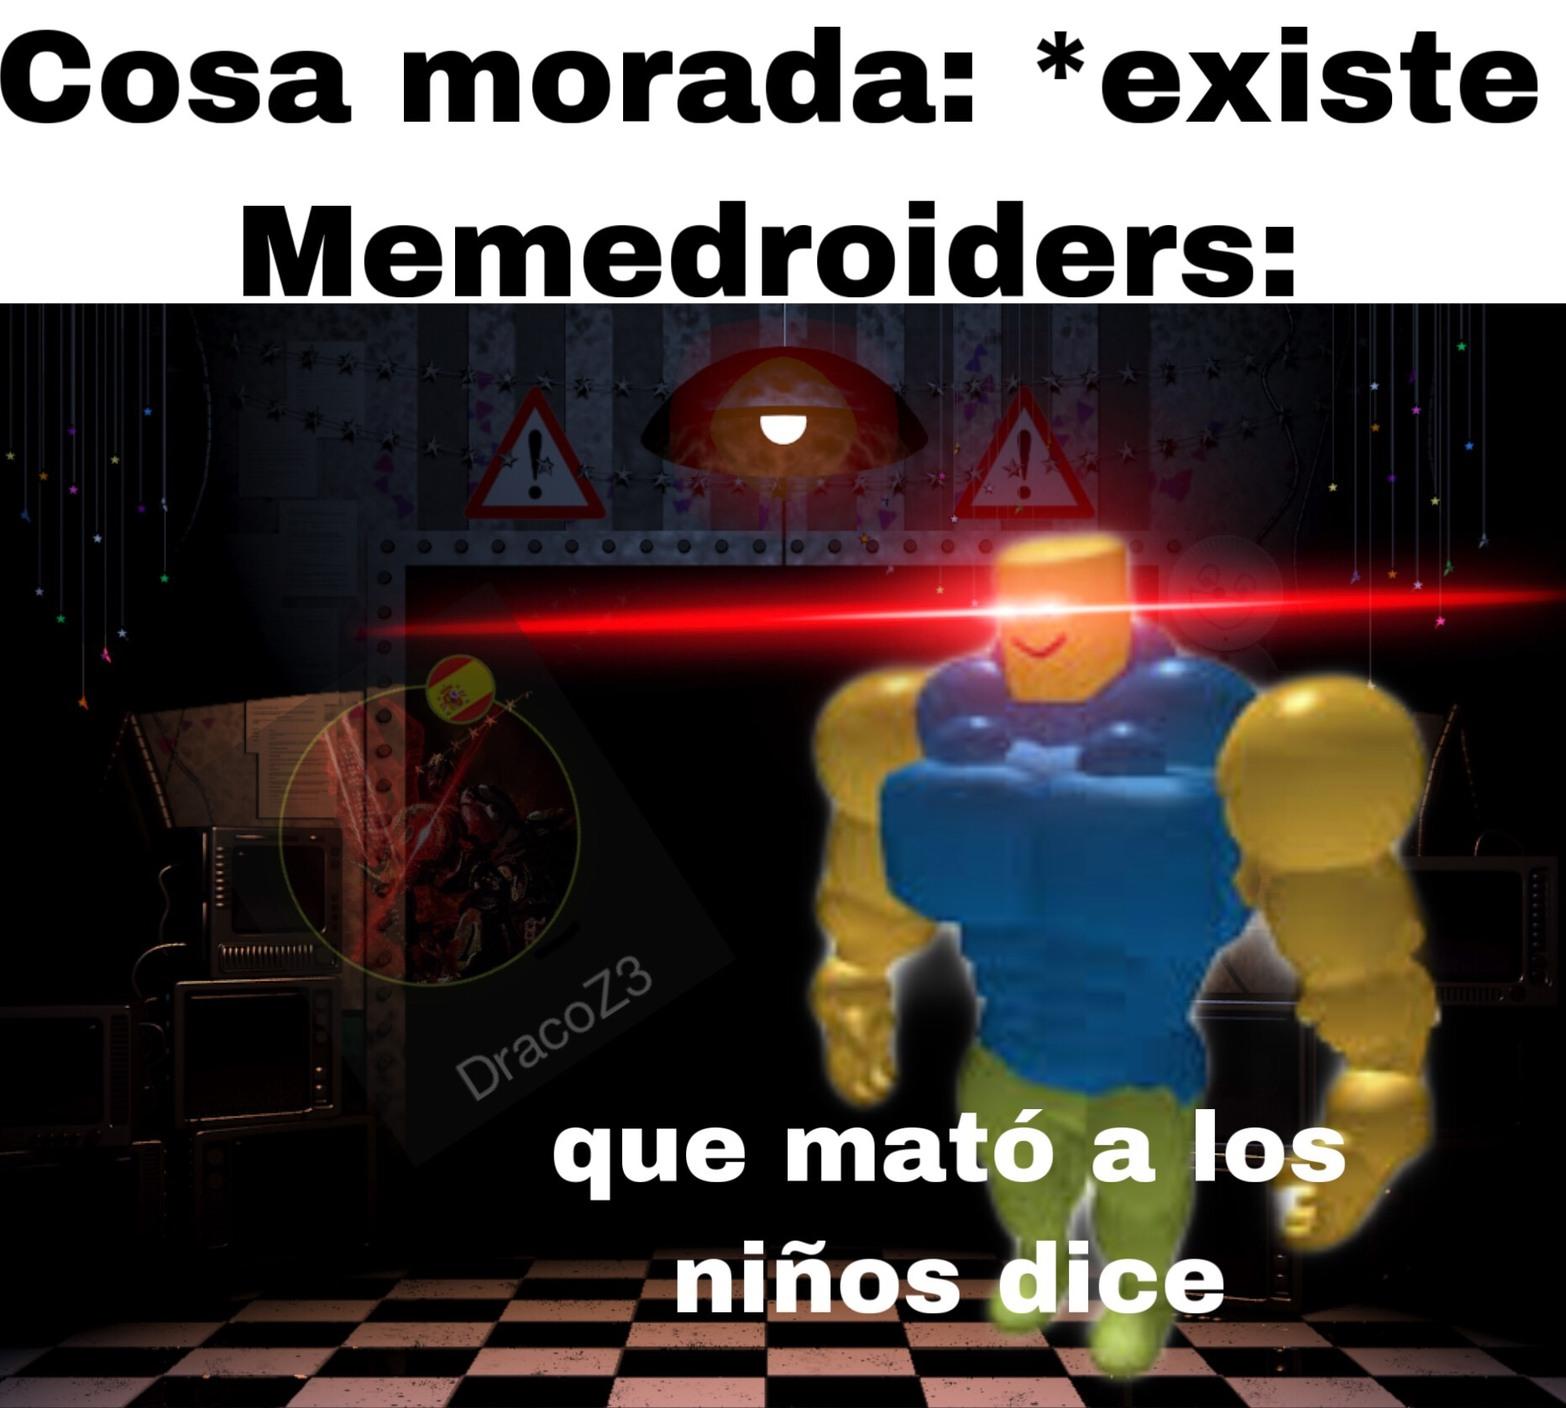 OOOOOOOOOOOOOF - meme